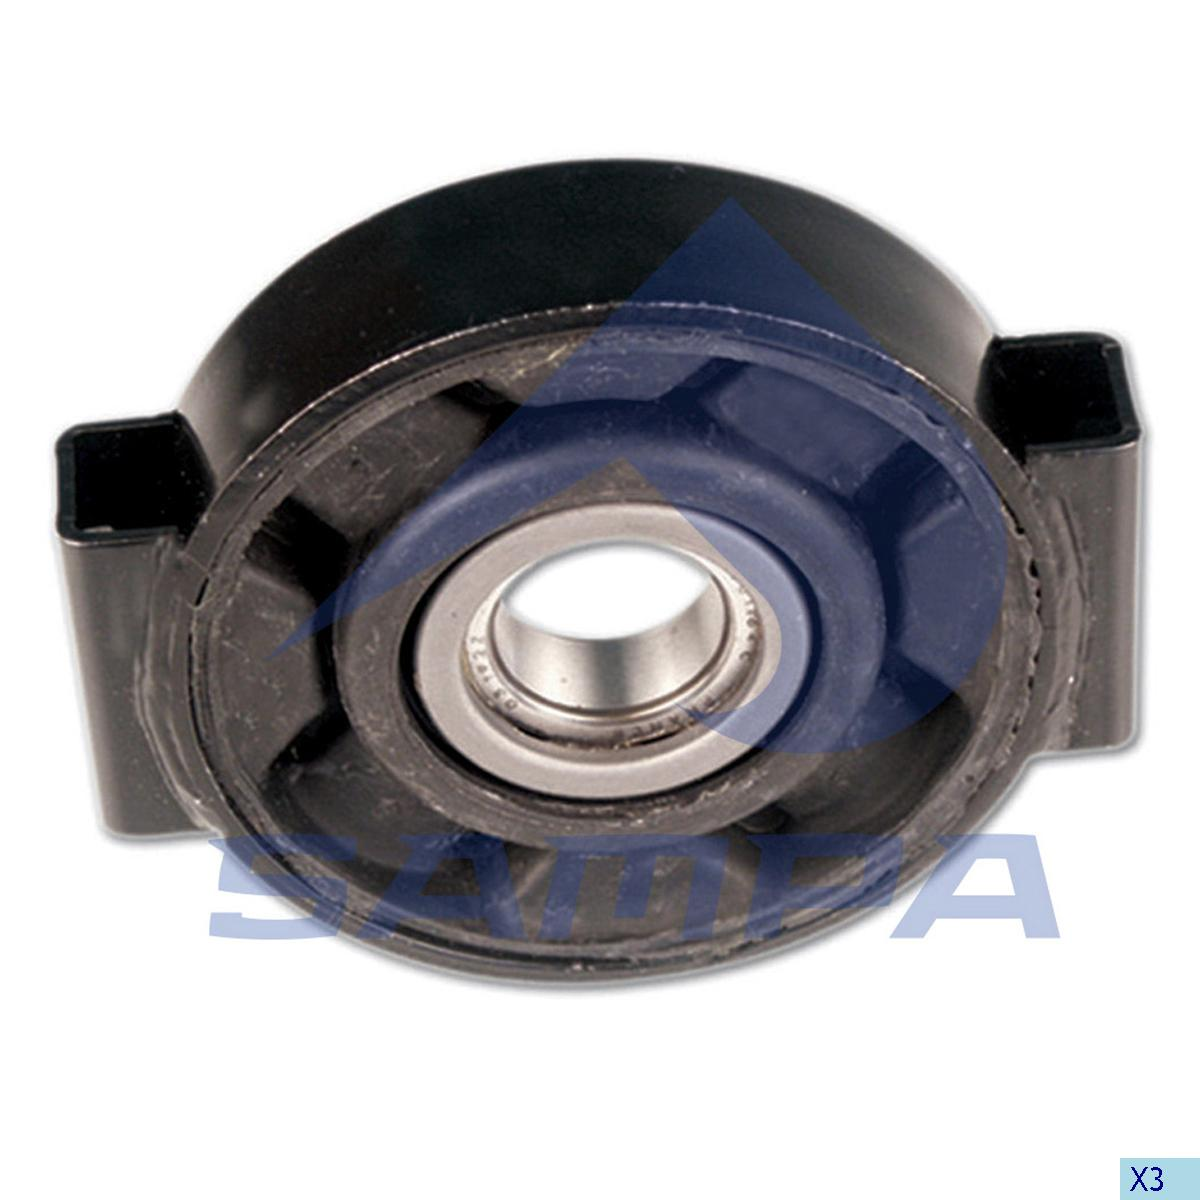 Propeller Shaft Bearing, Mercedes, Propeller Shaft